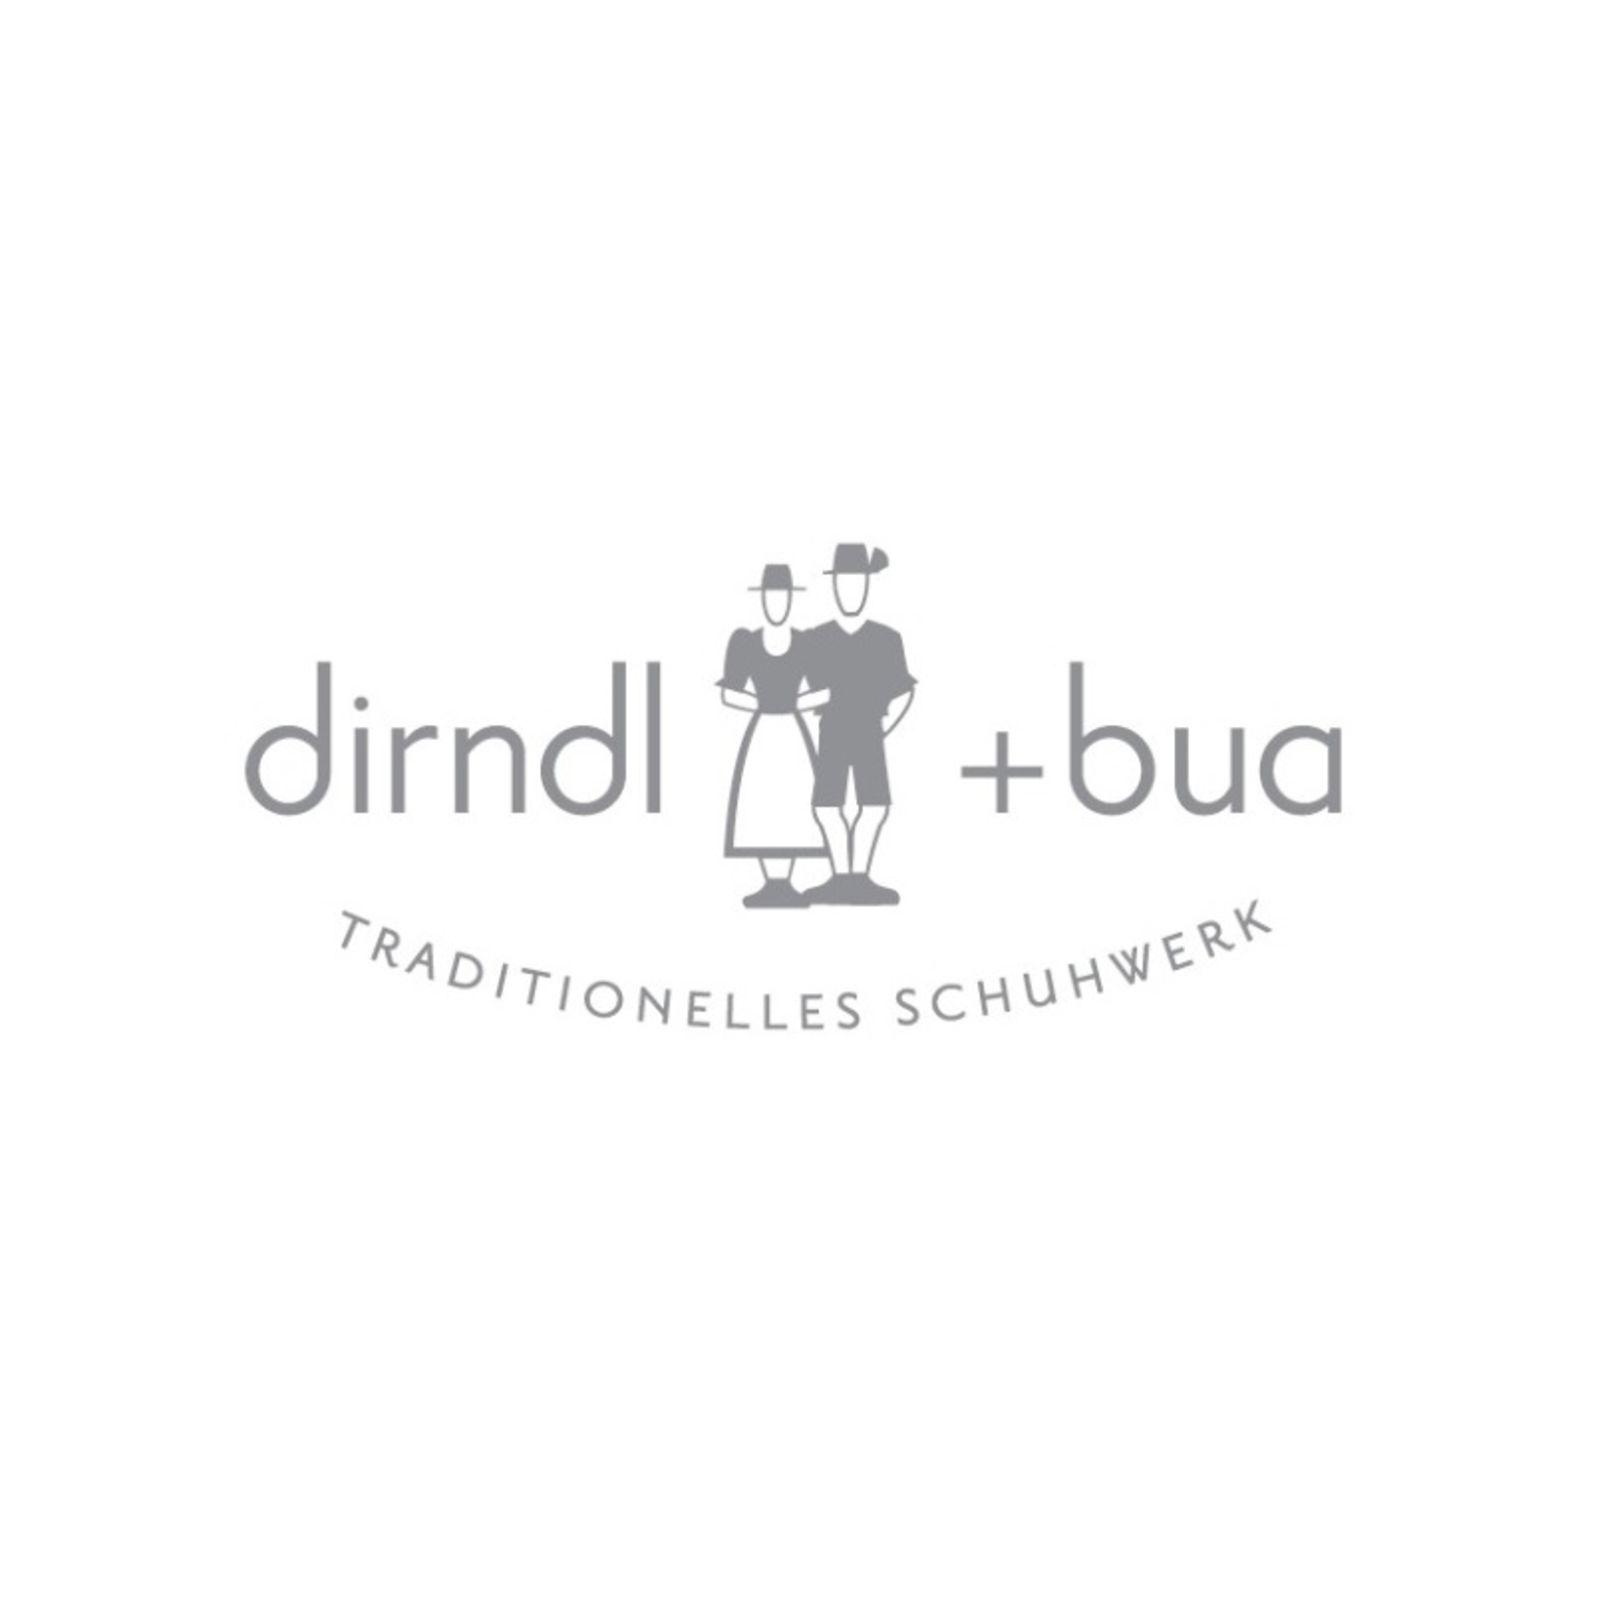 dirndl+bua